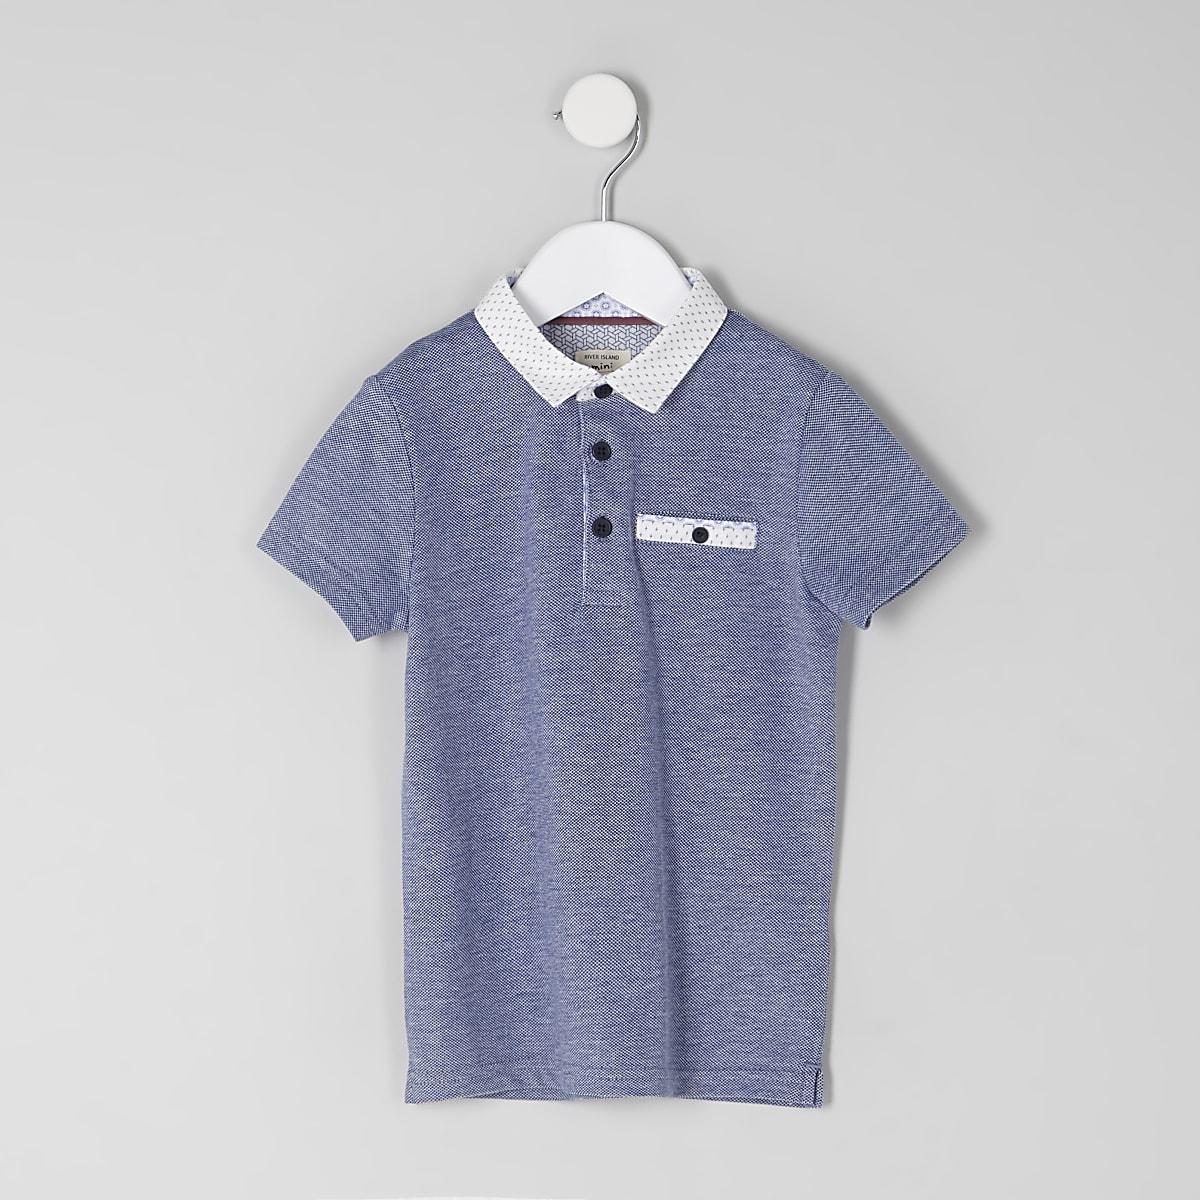 Polo bleu marine texturé mini garçon